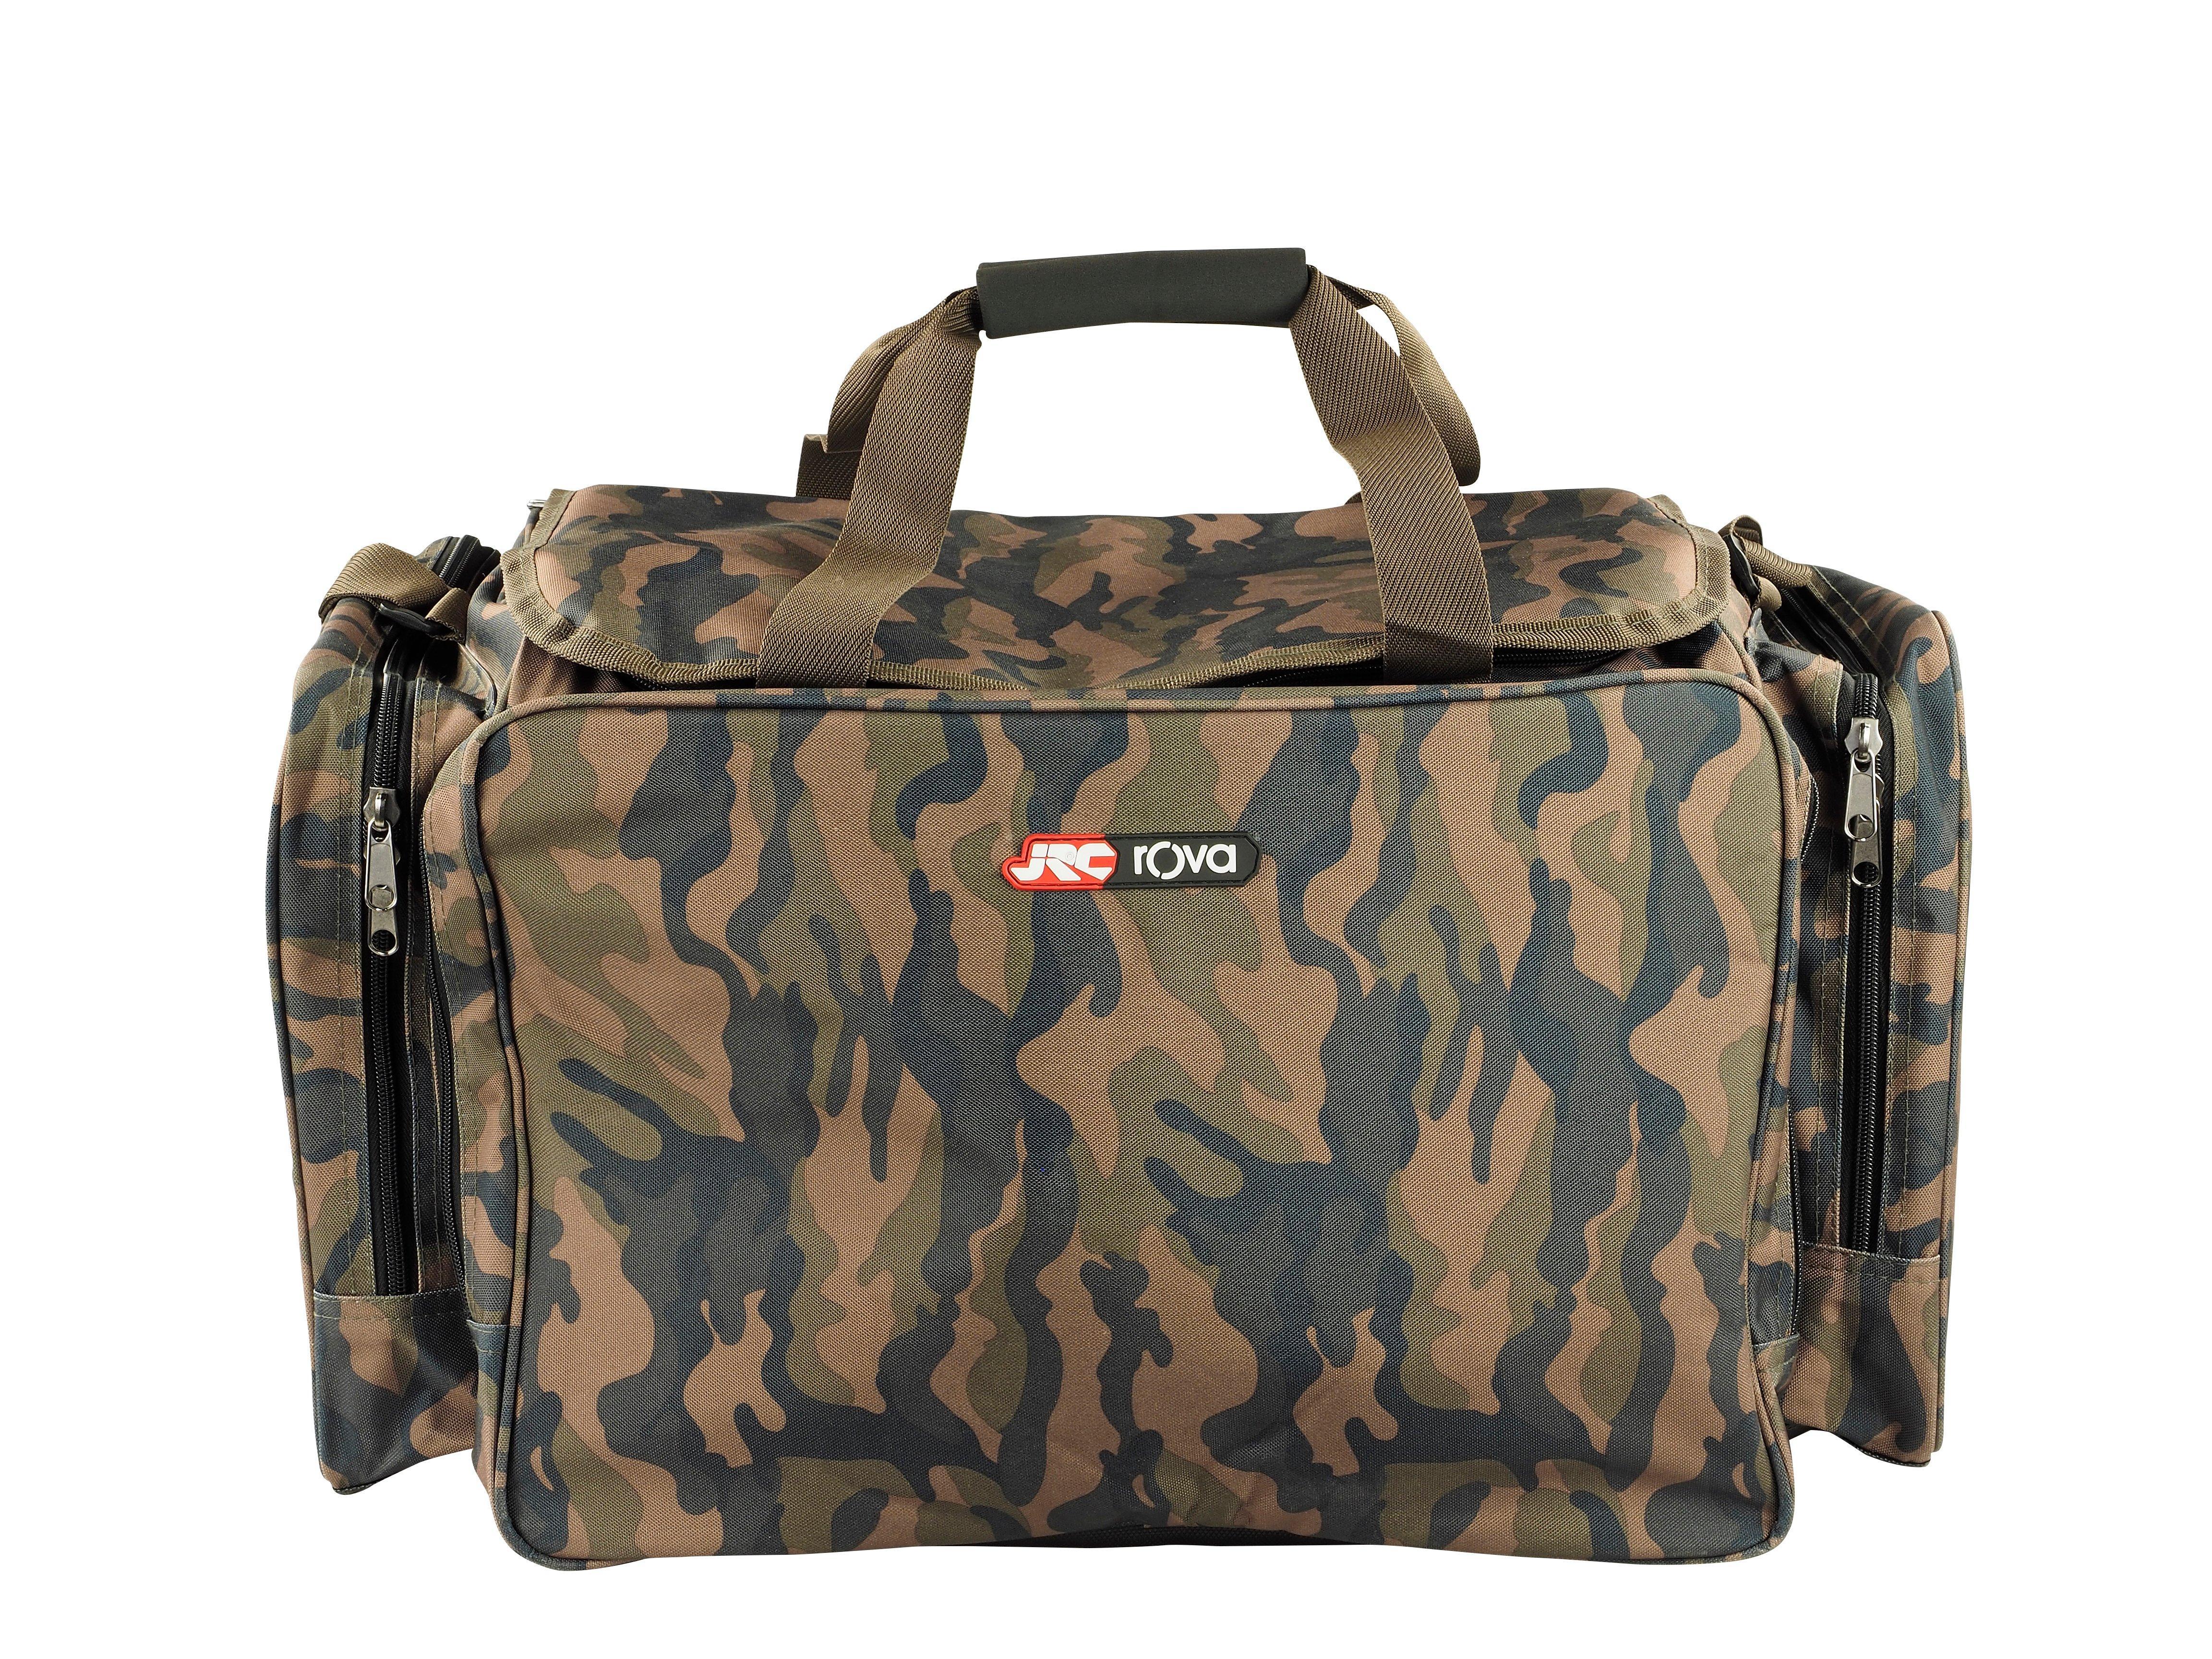 JRC DEFENDER Carryall COMPACT Carp Fishing Luggage Bag *